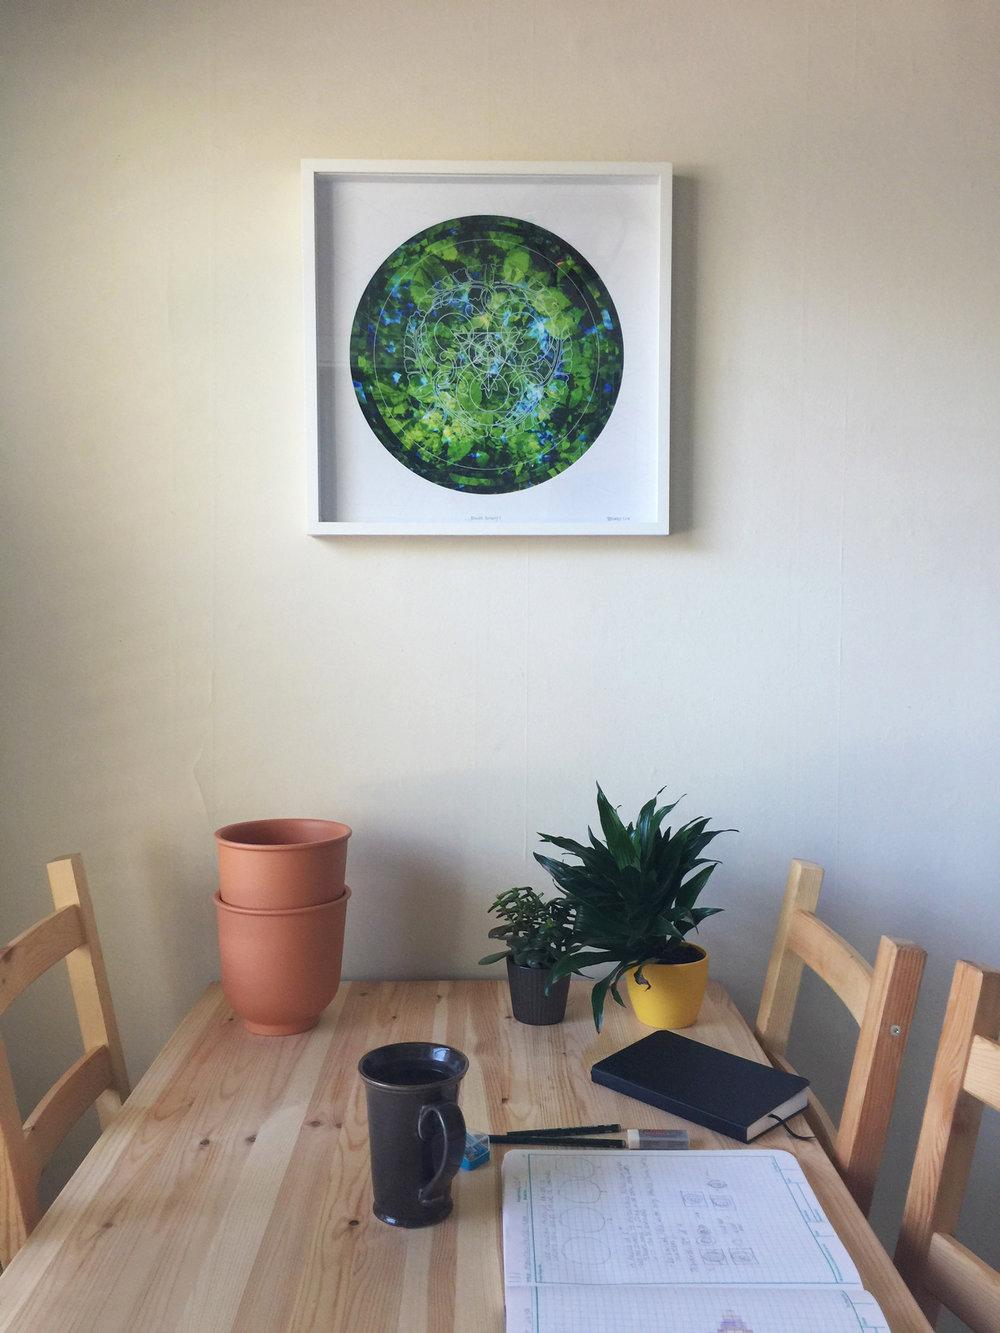 Rainier-Botany-7-on-wall.jpg